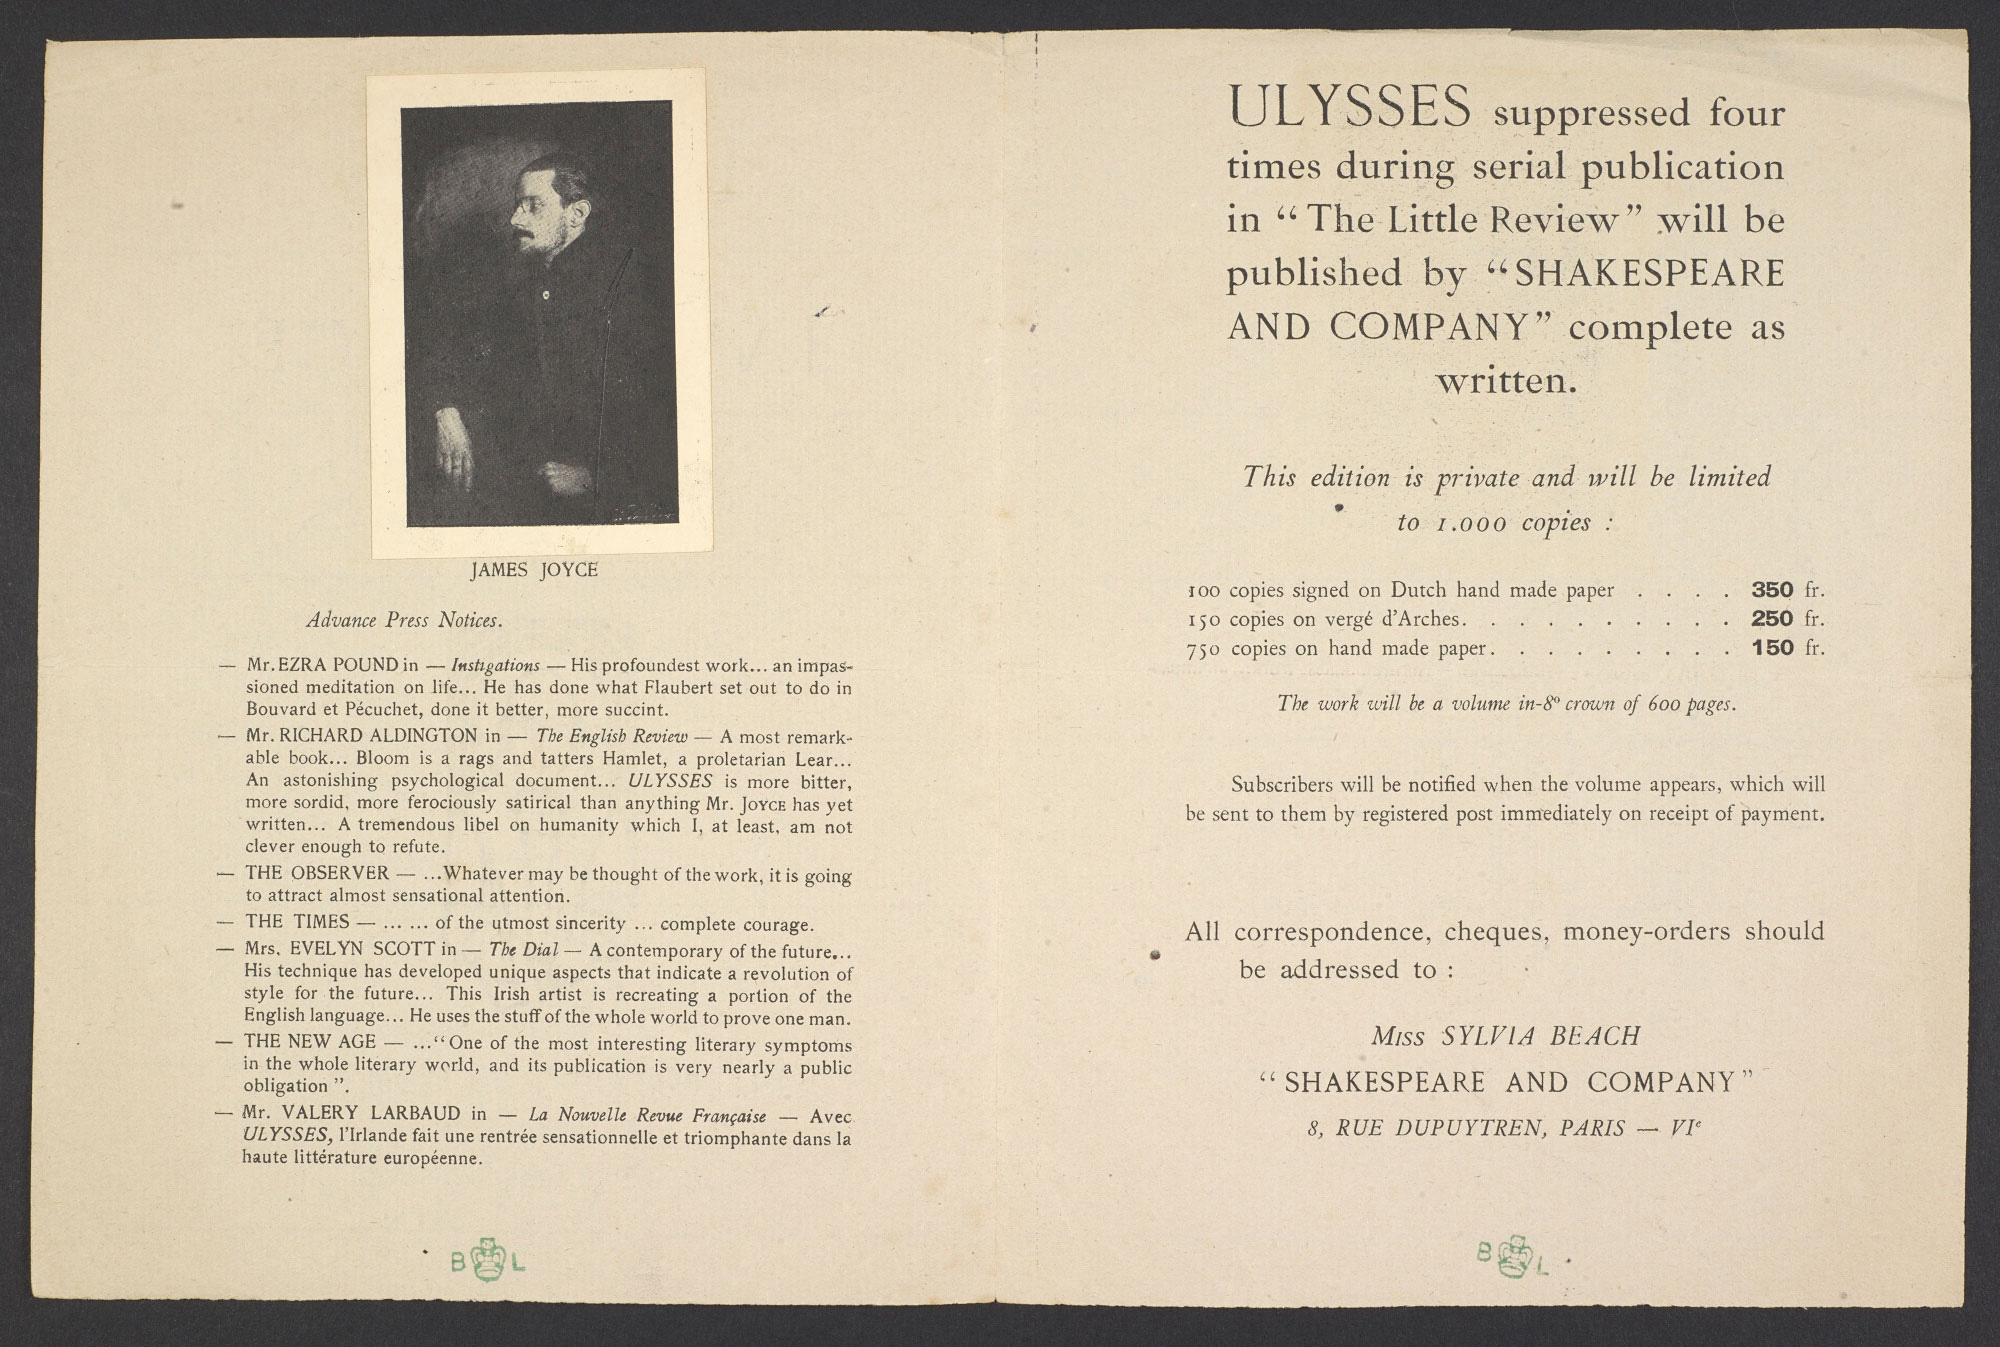 G B Shaw's order form for Ulysses